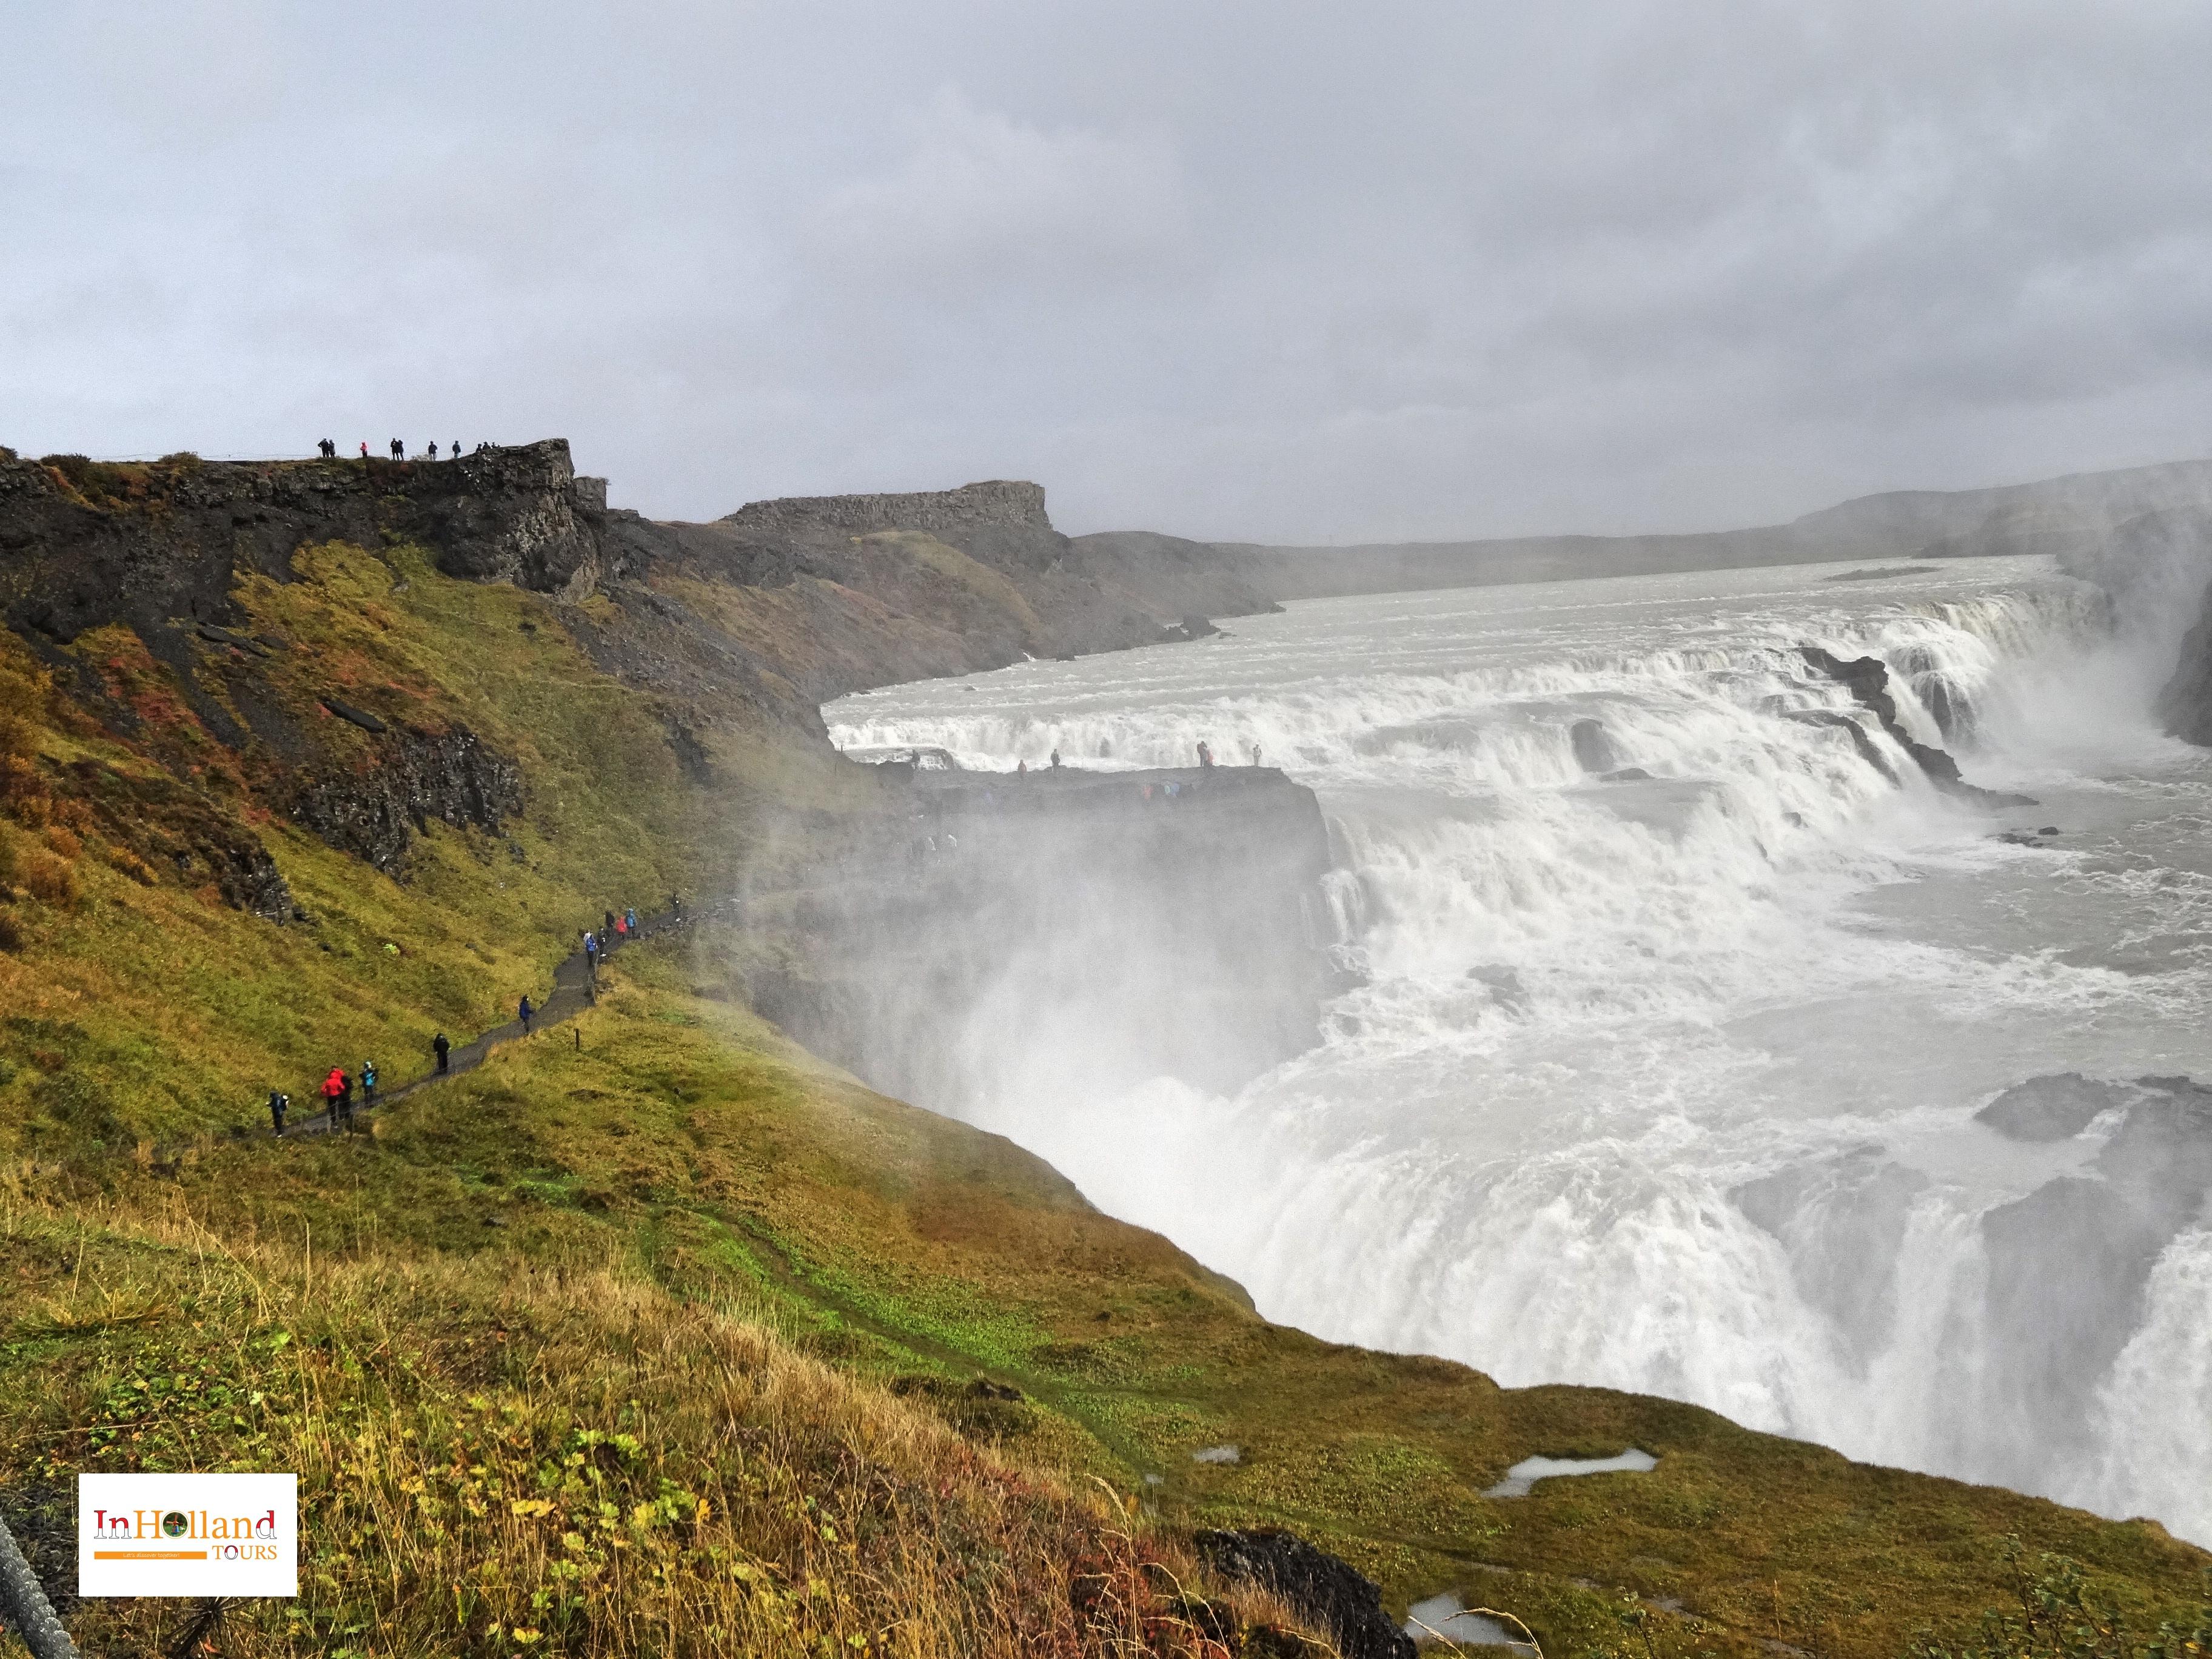 keliling eropa ke negara dingin islandia